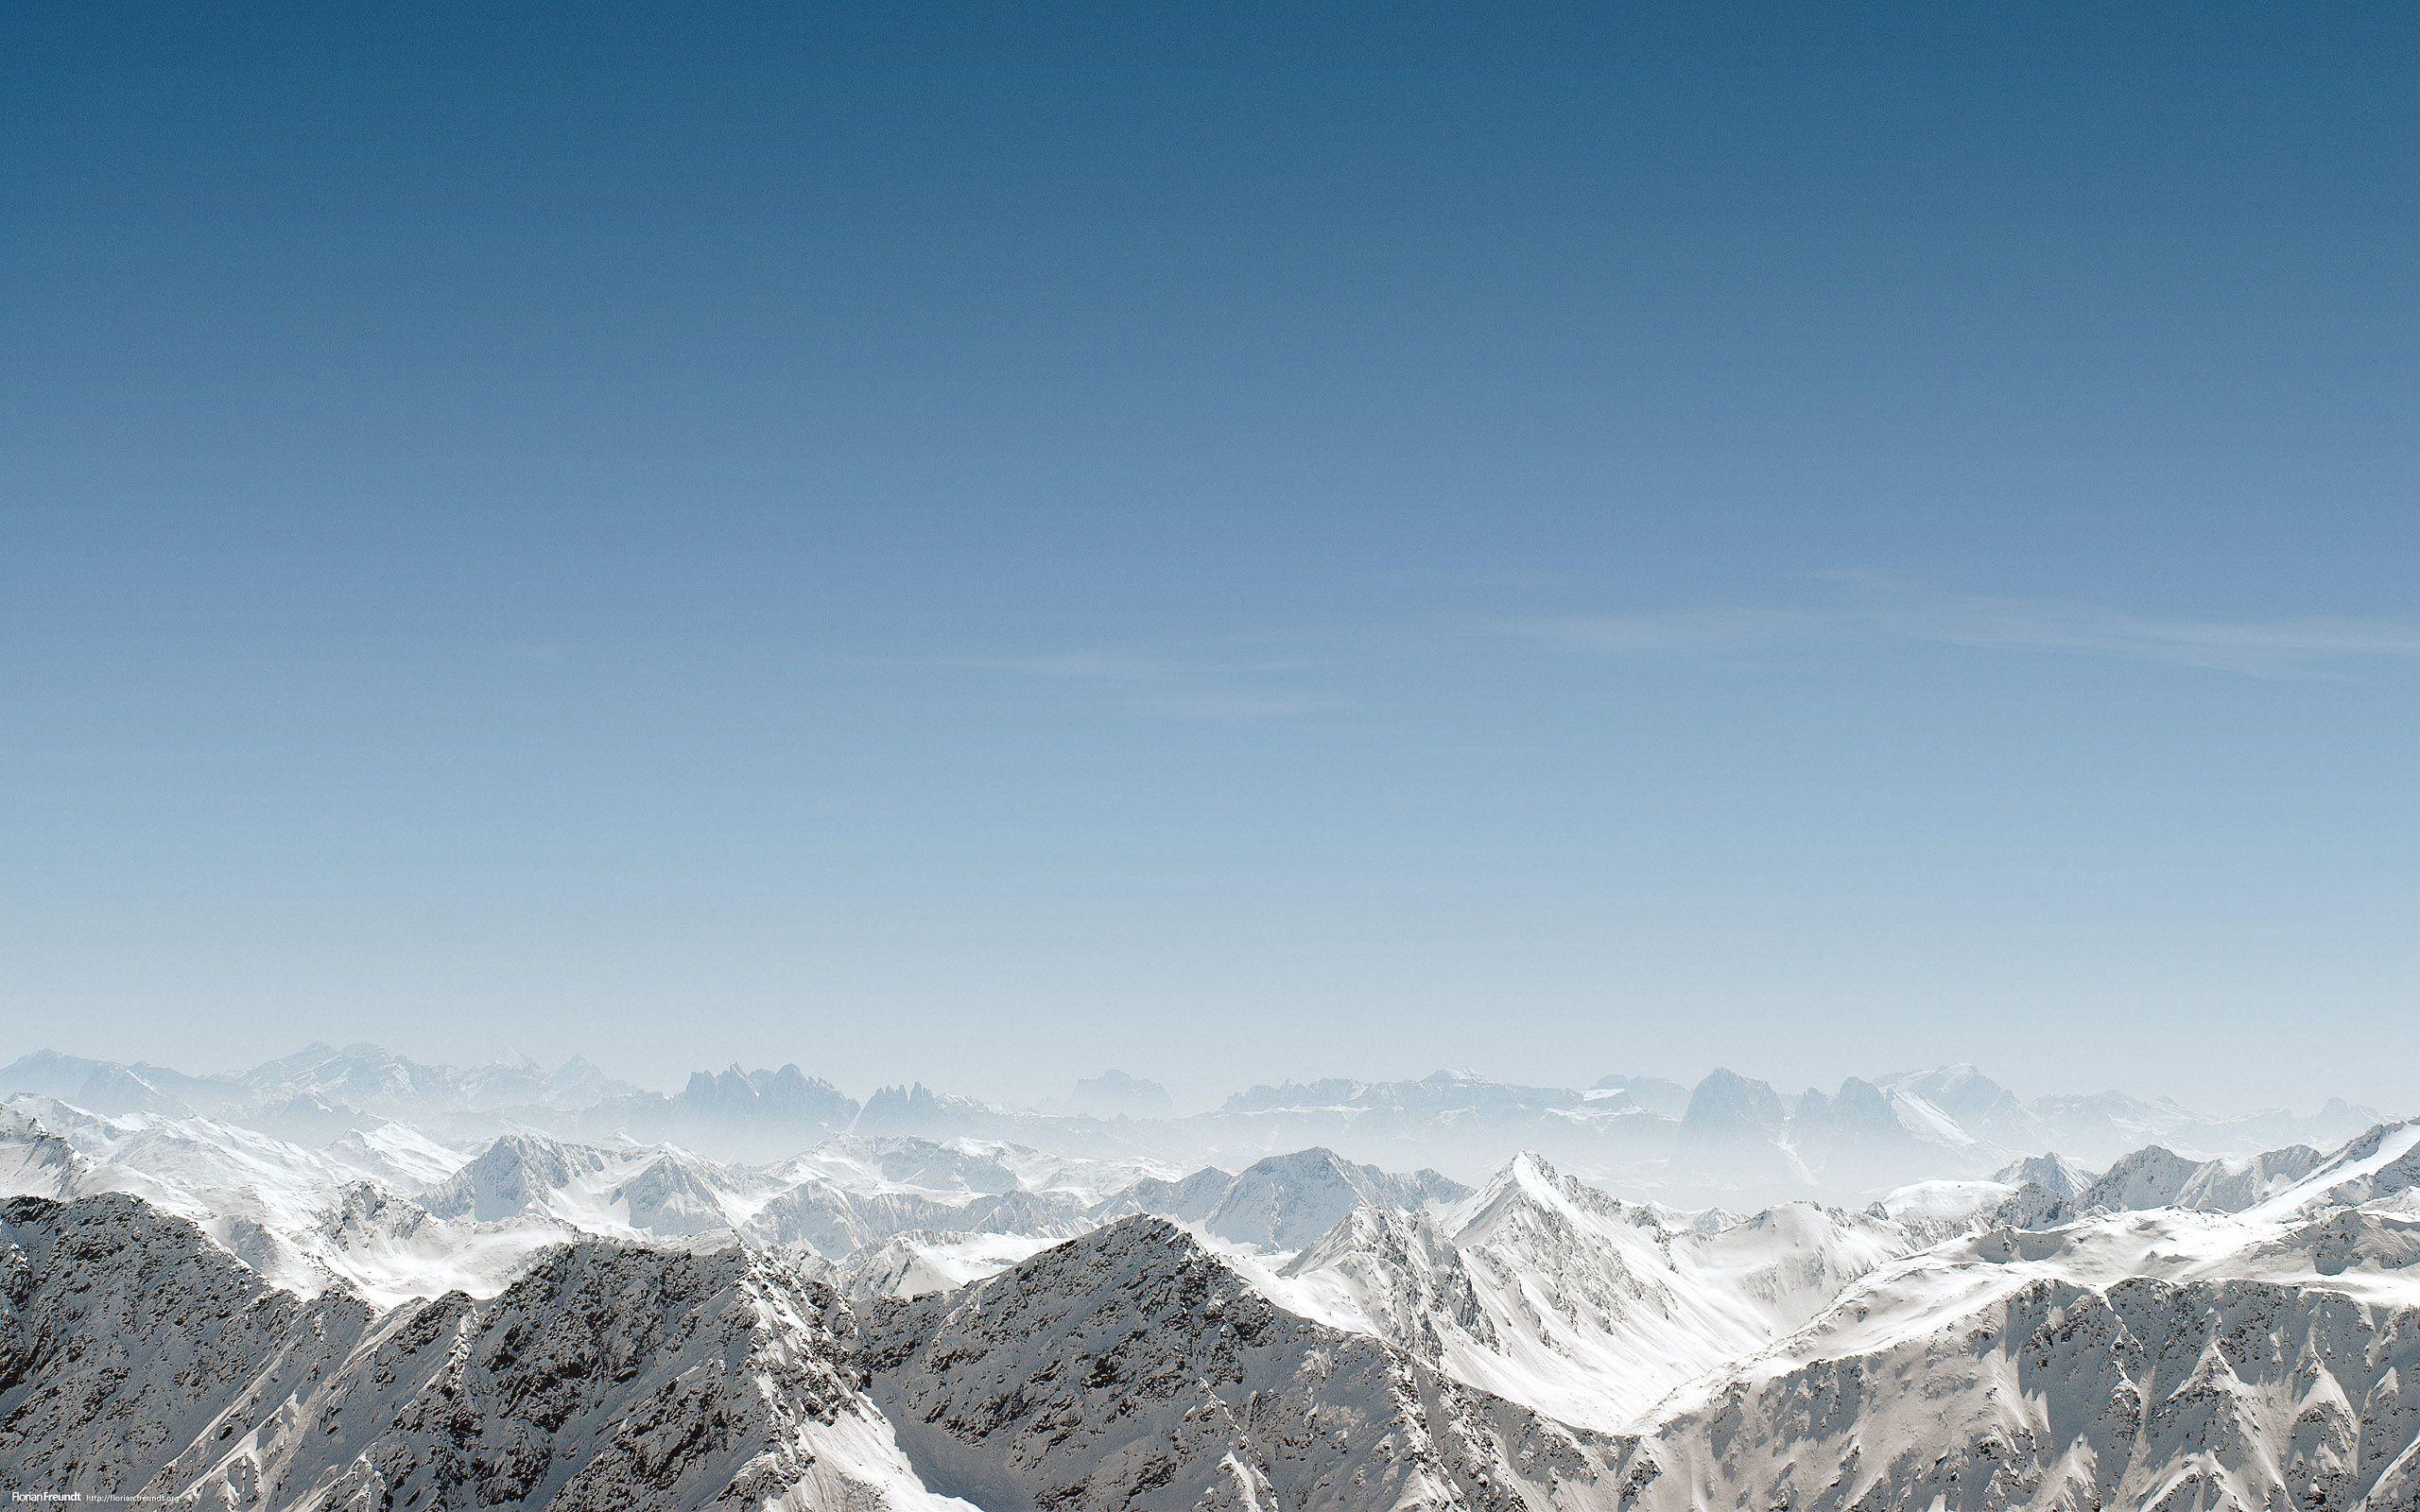 Wallpaper mountains, simple, sky, blue sky, snow desktop wallpaper .